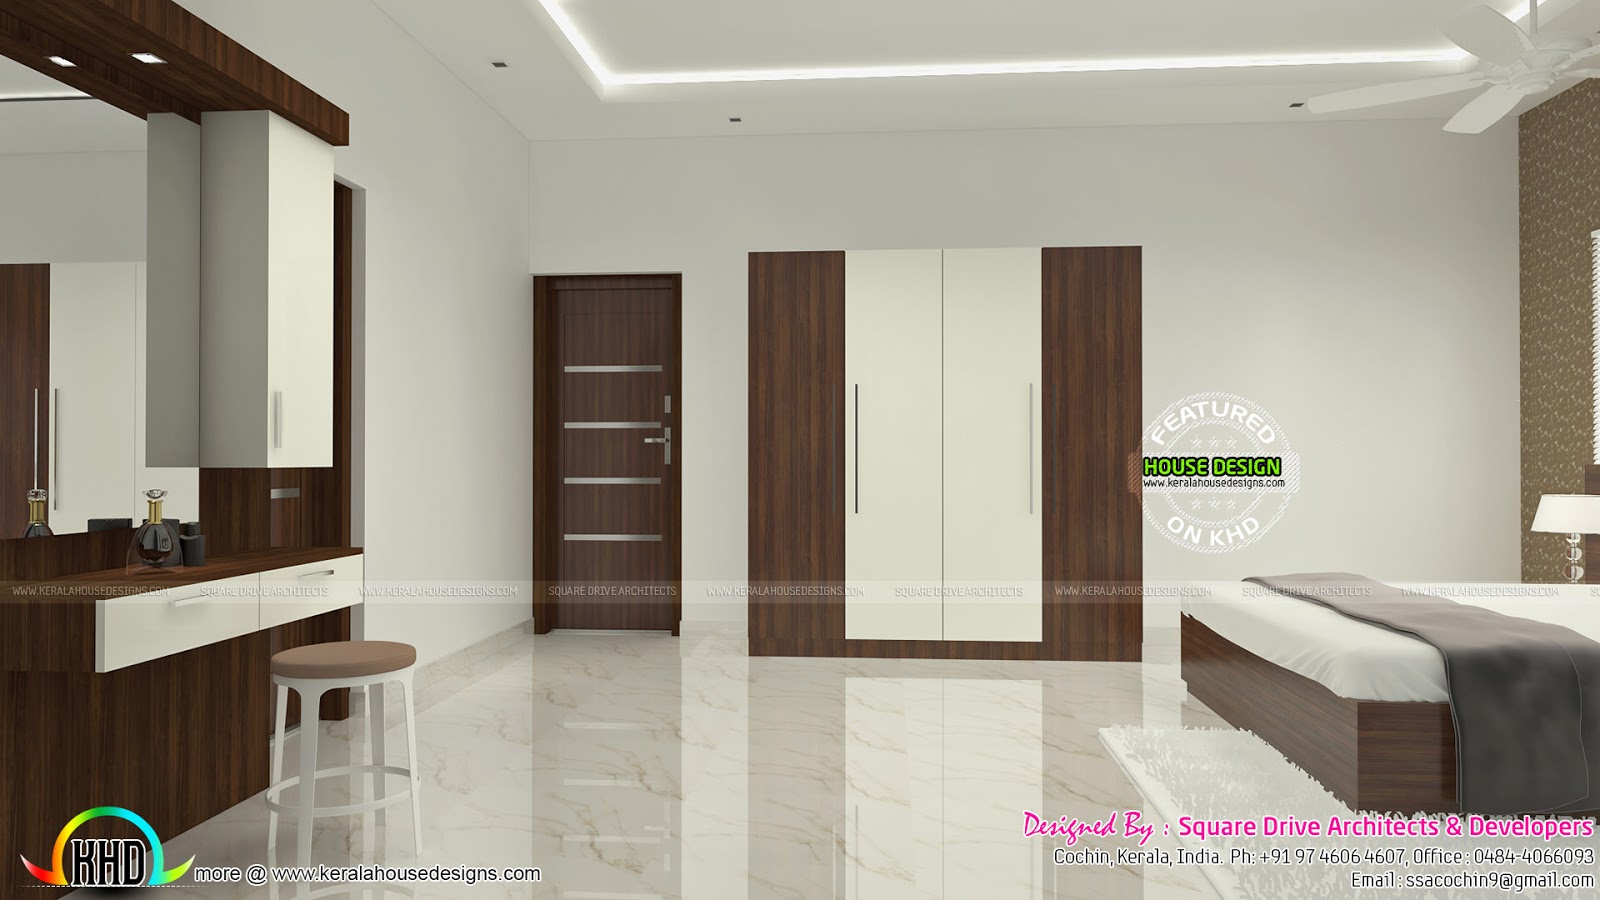 Courtyard kitchen and bedroom interiors kerala home for Bedroom designs kerala